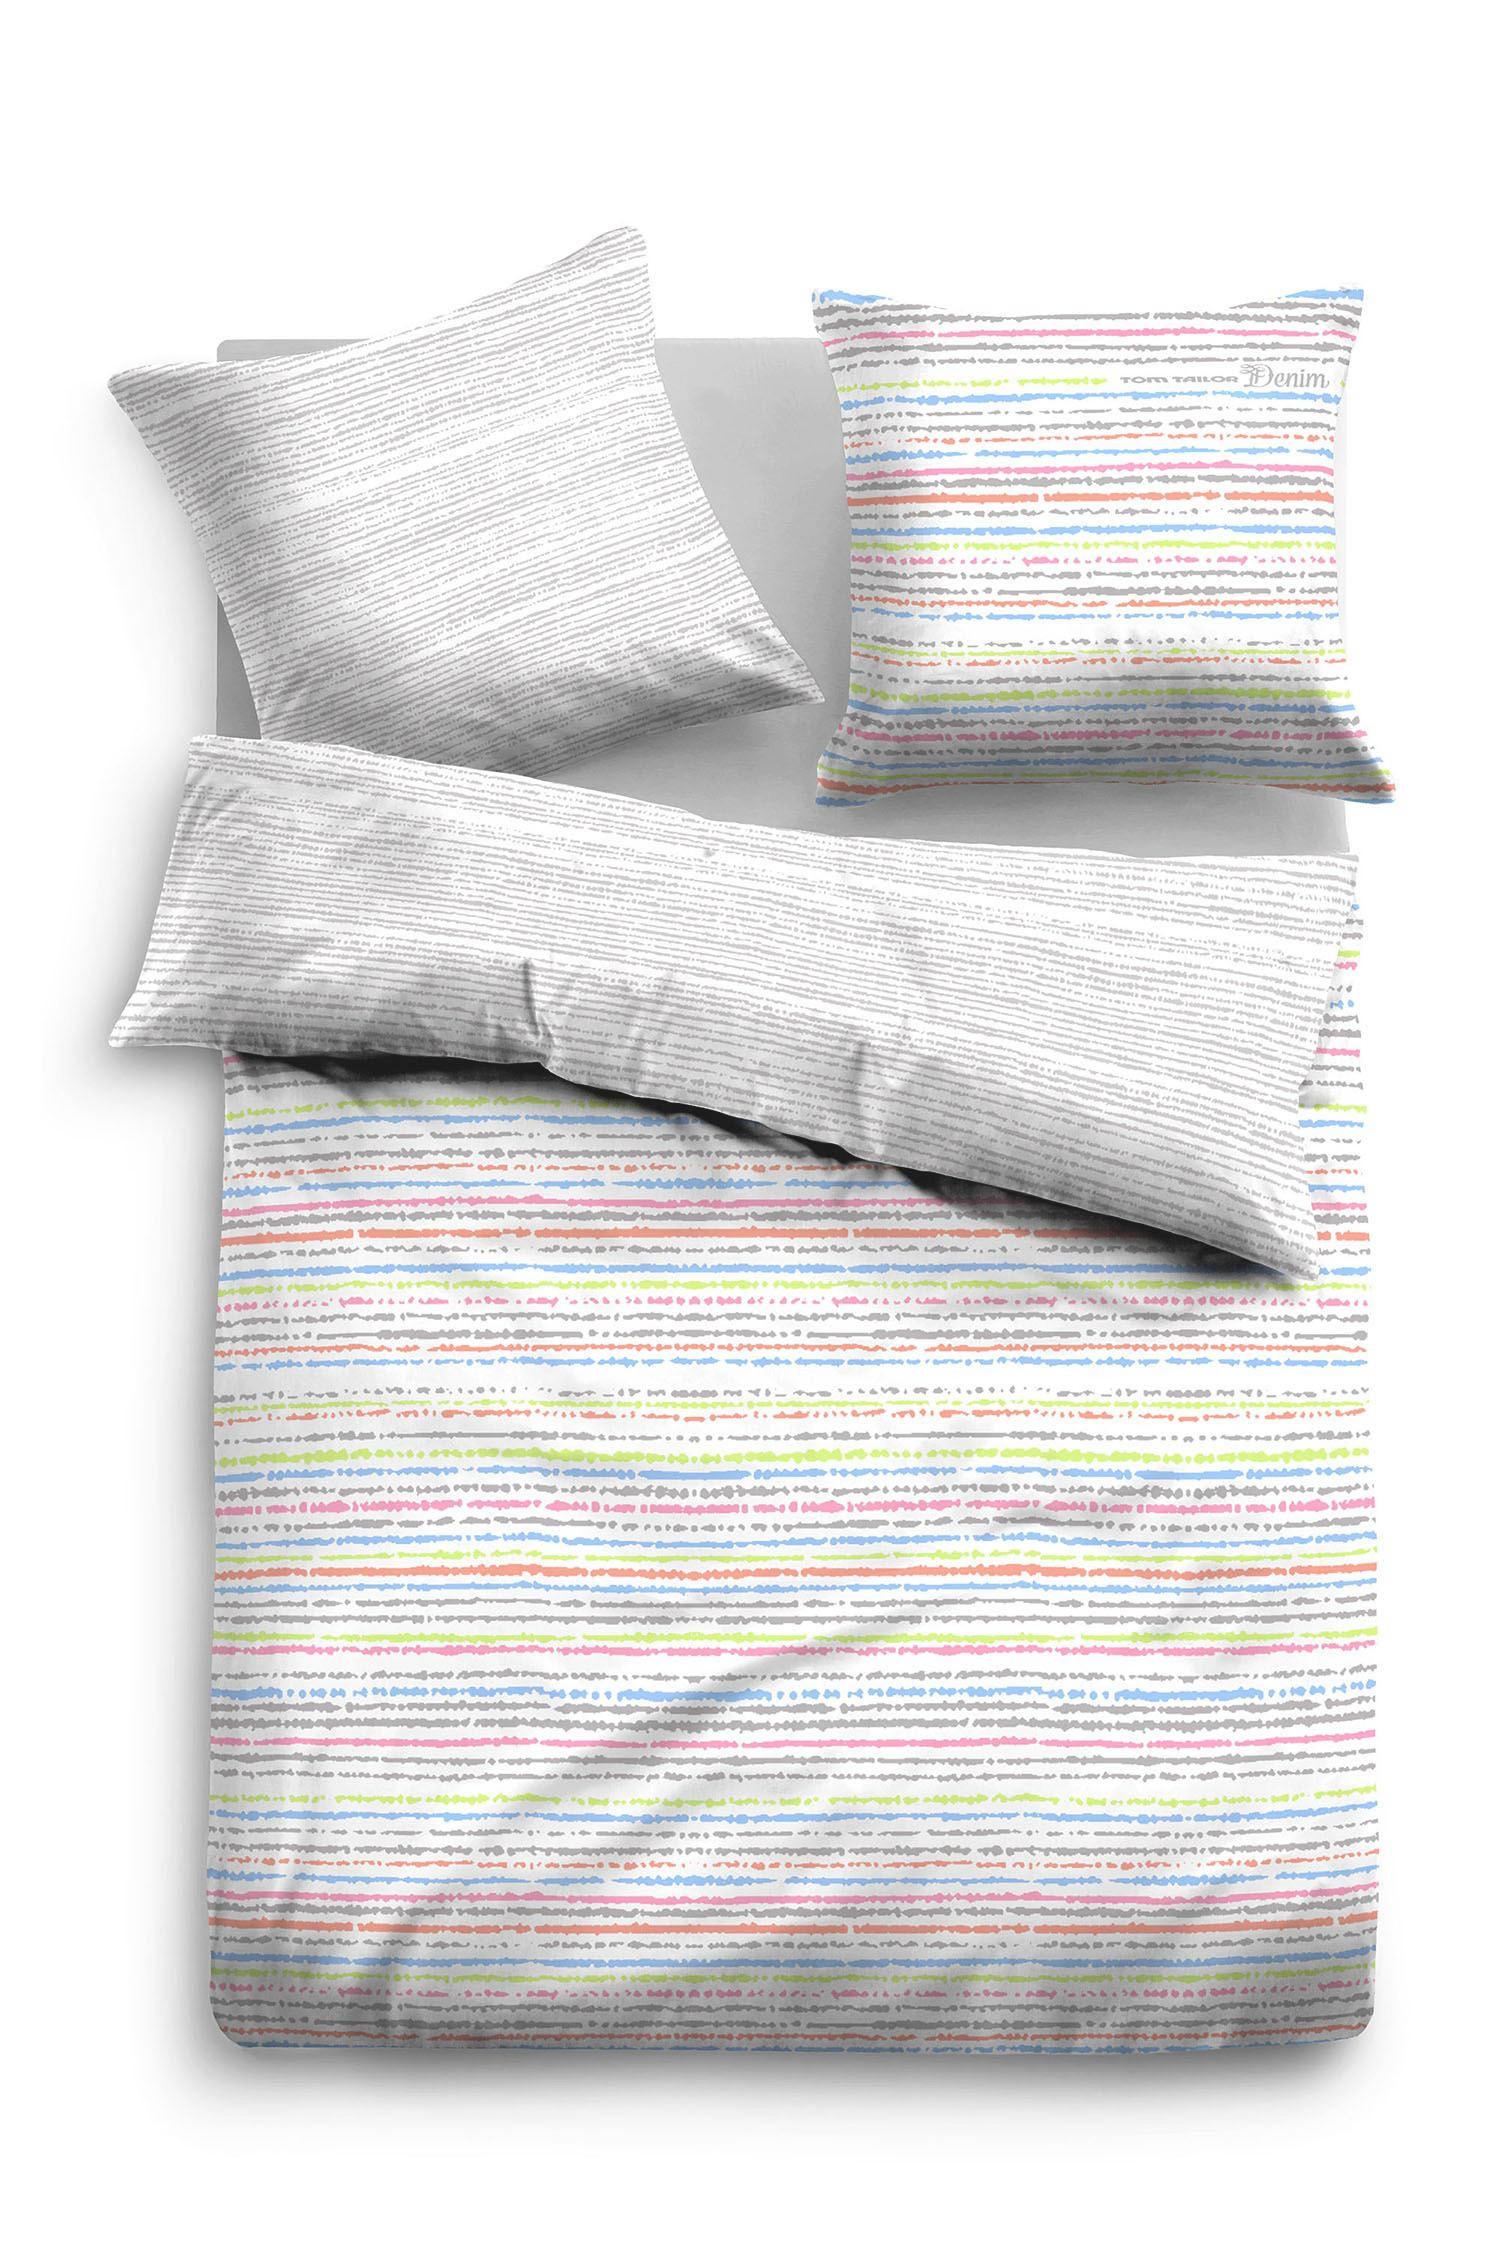 POSTELJINA ZA MLADE - bijela/bež, Design, tekstil (135/200cm) - TOM TAILOR